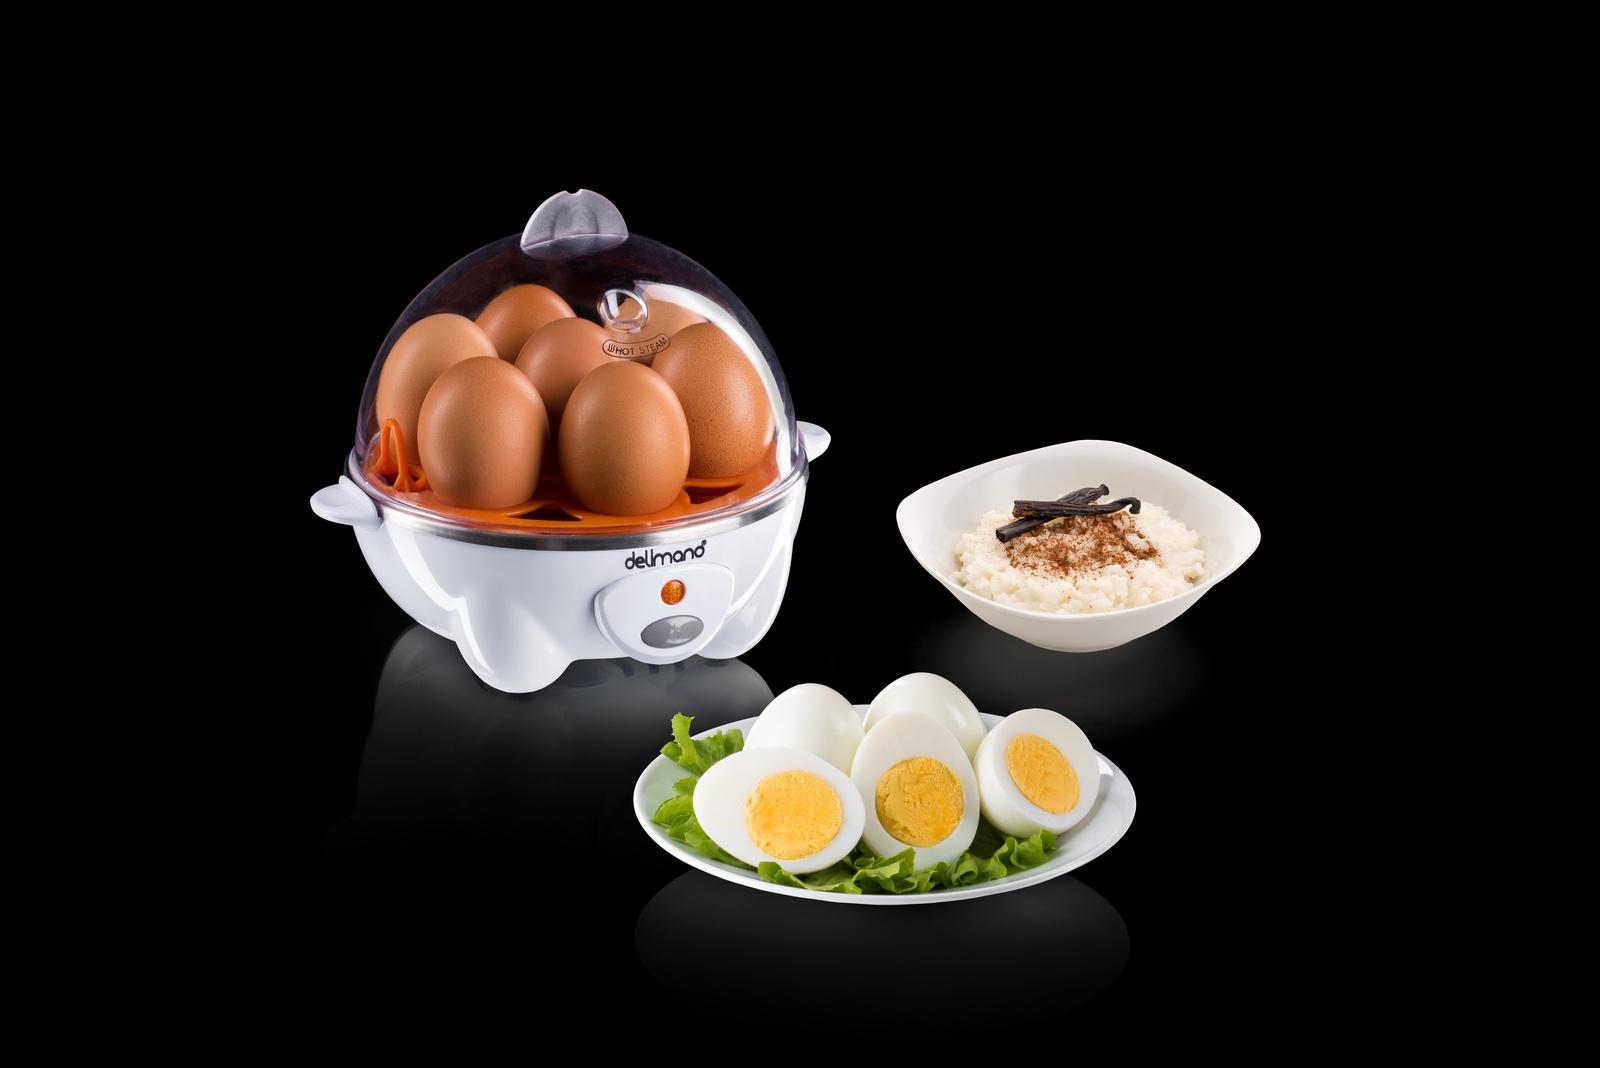 Яйцеварка Delimano Utile Egg Master Pro, белый, оранжевый Delimano